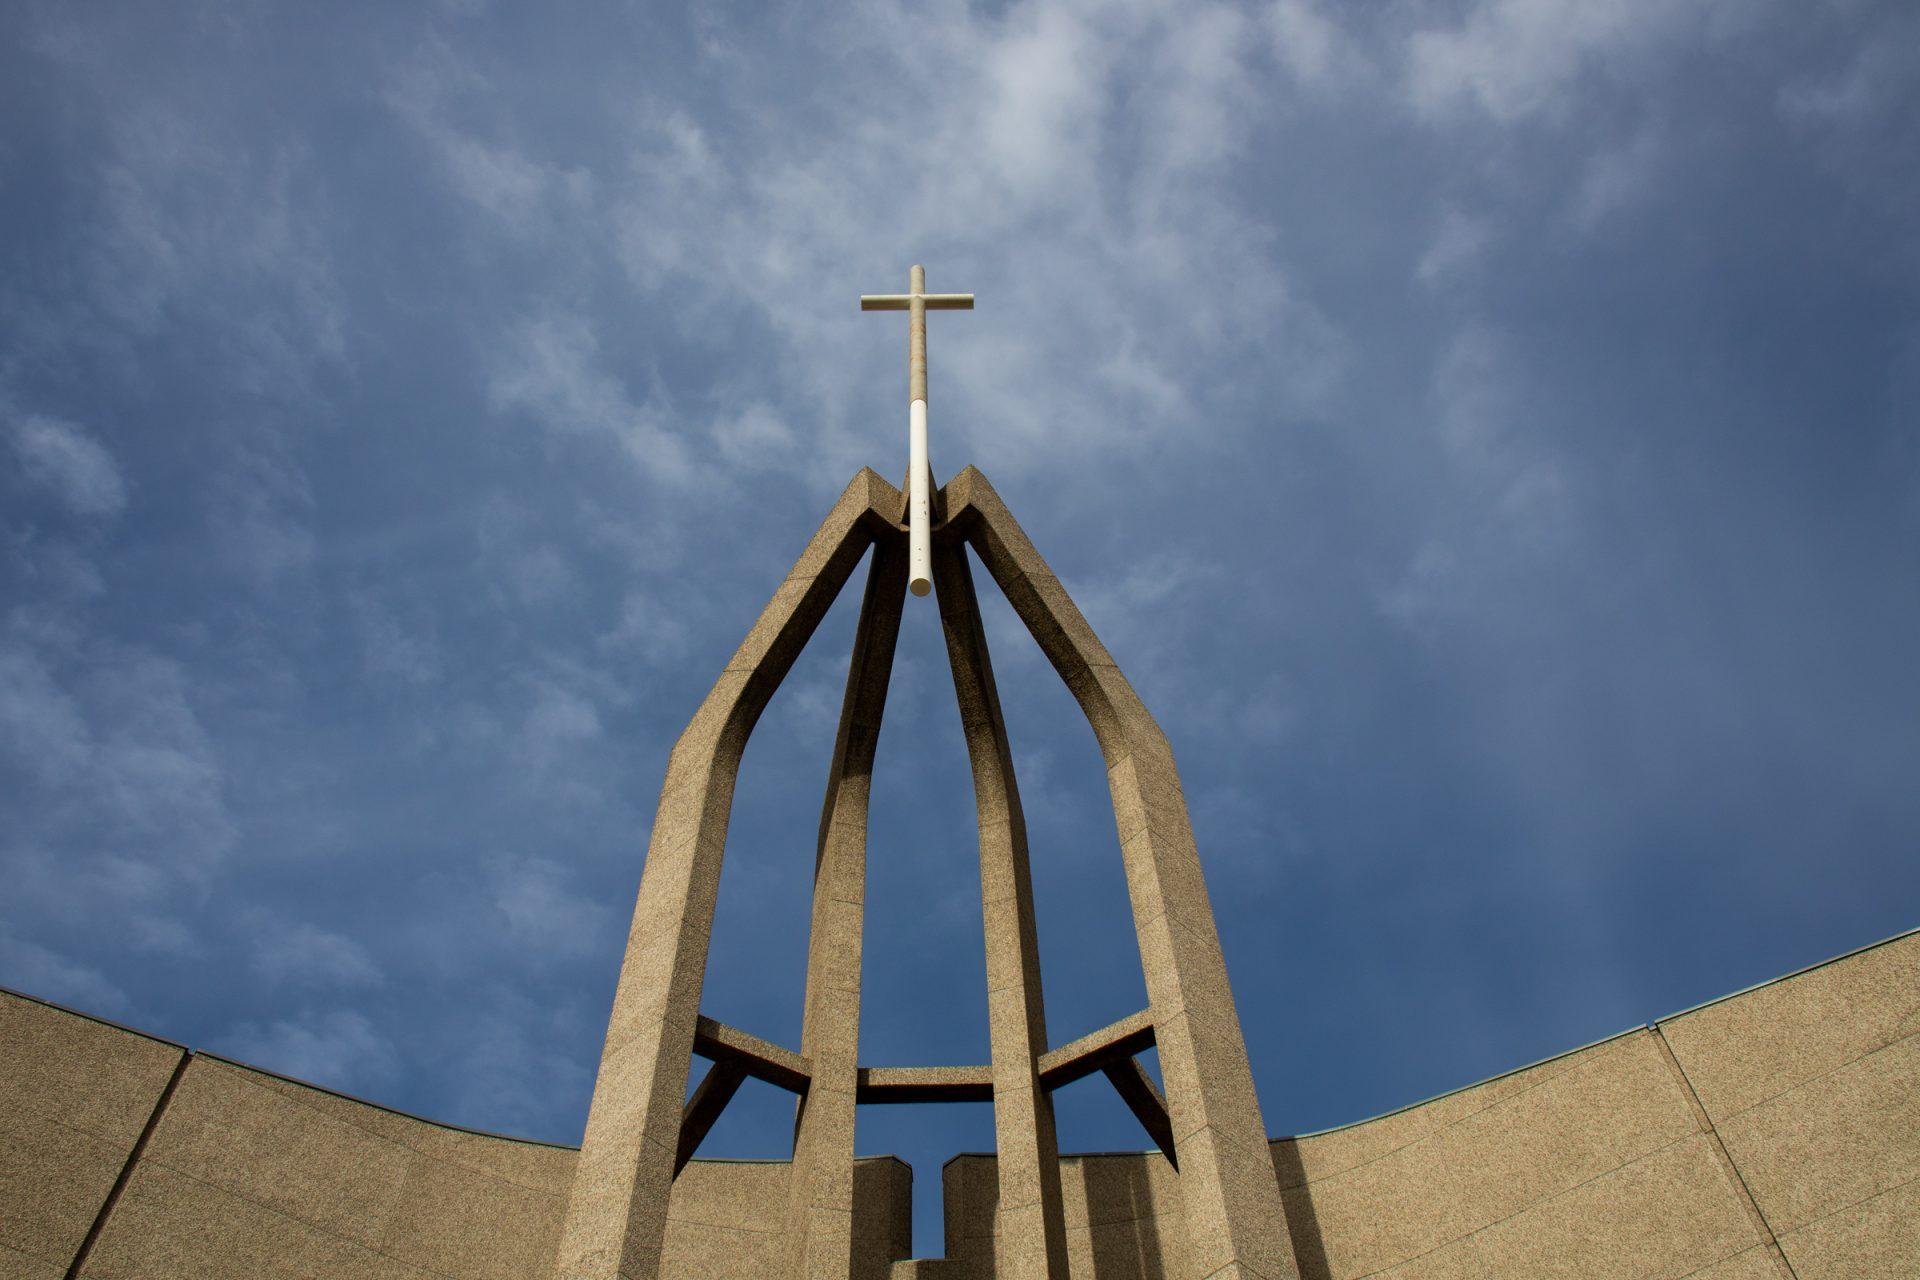 Cross On Concrete Structure